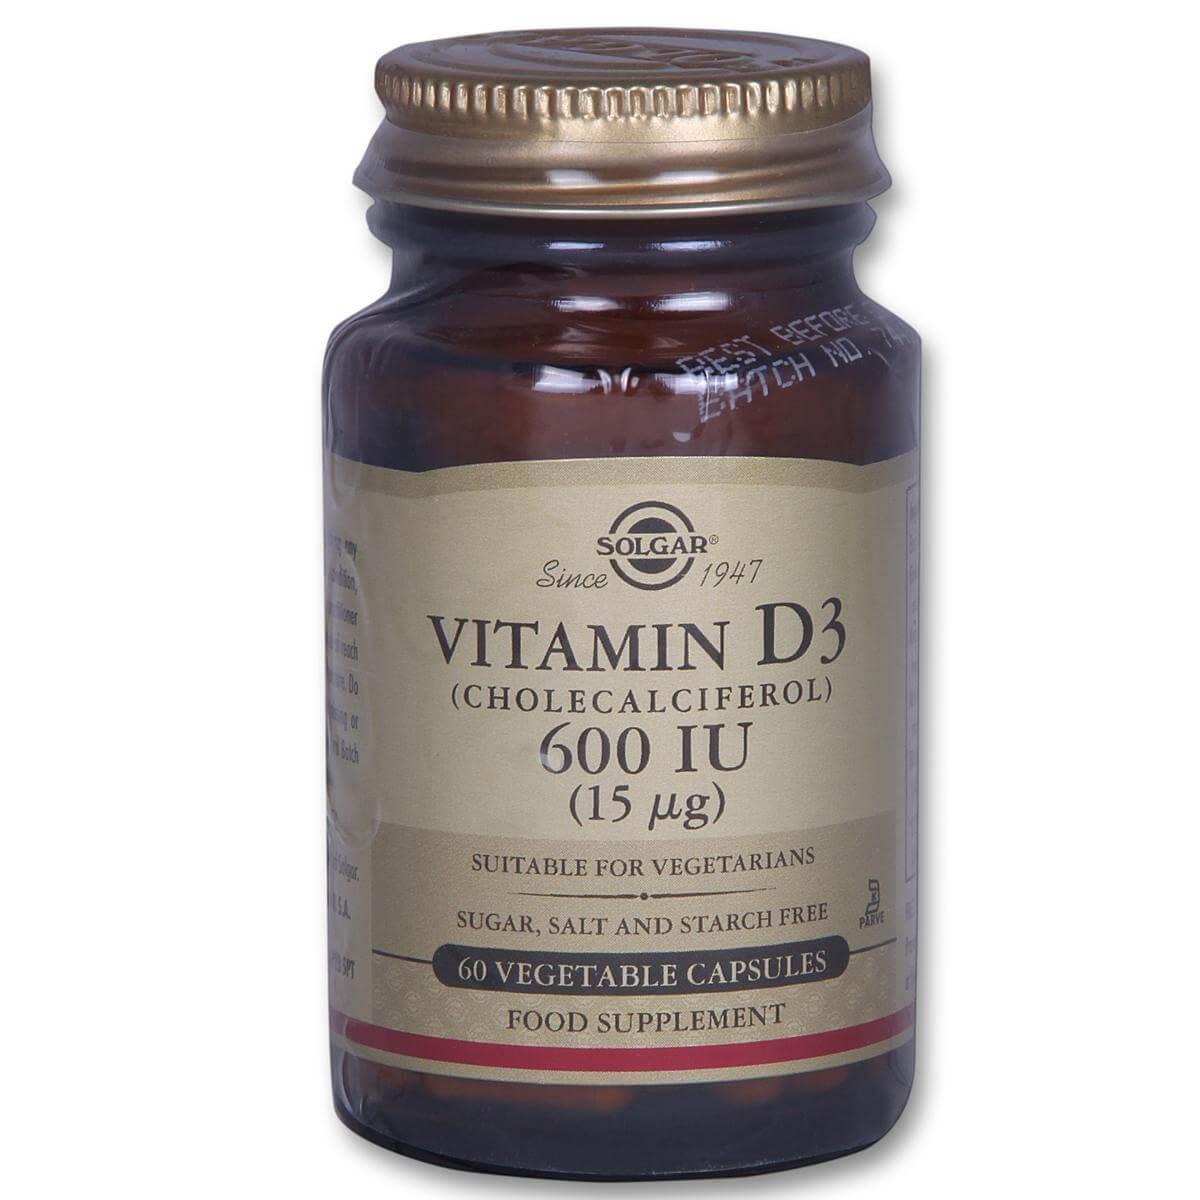 Solgar Vitamin D3 600iu Συμπλήρωμα Διατροφής Βιταμίνης D3 Ιδανική σε Περιπτώσεις Οστεοπόρωσης 60veg.caps